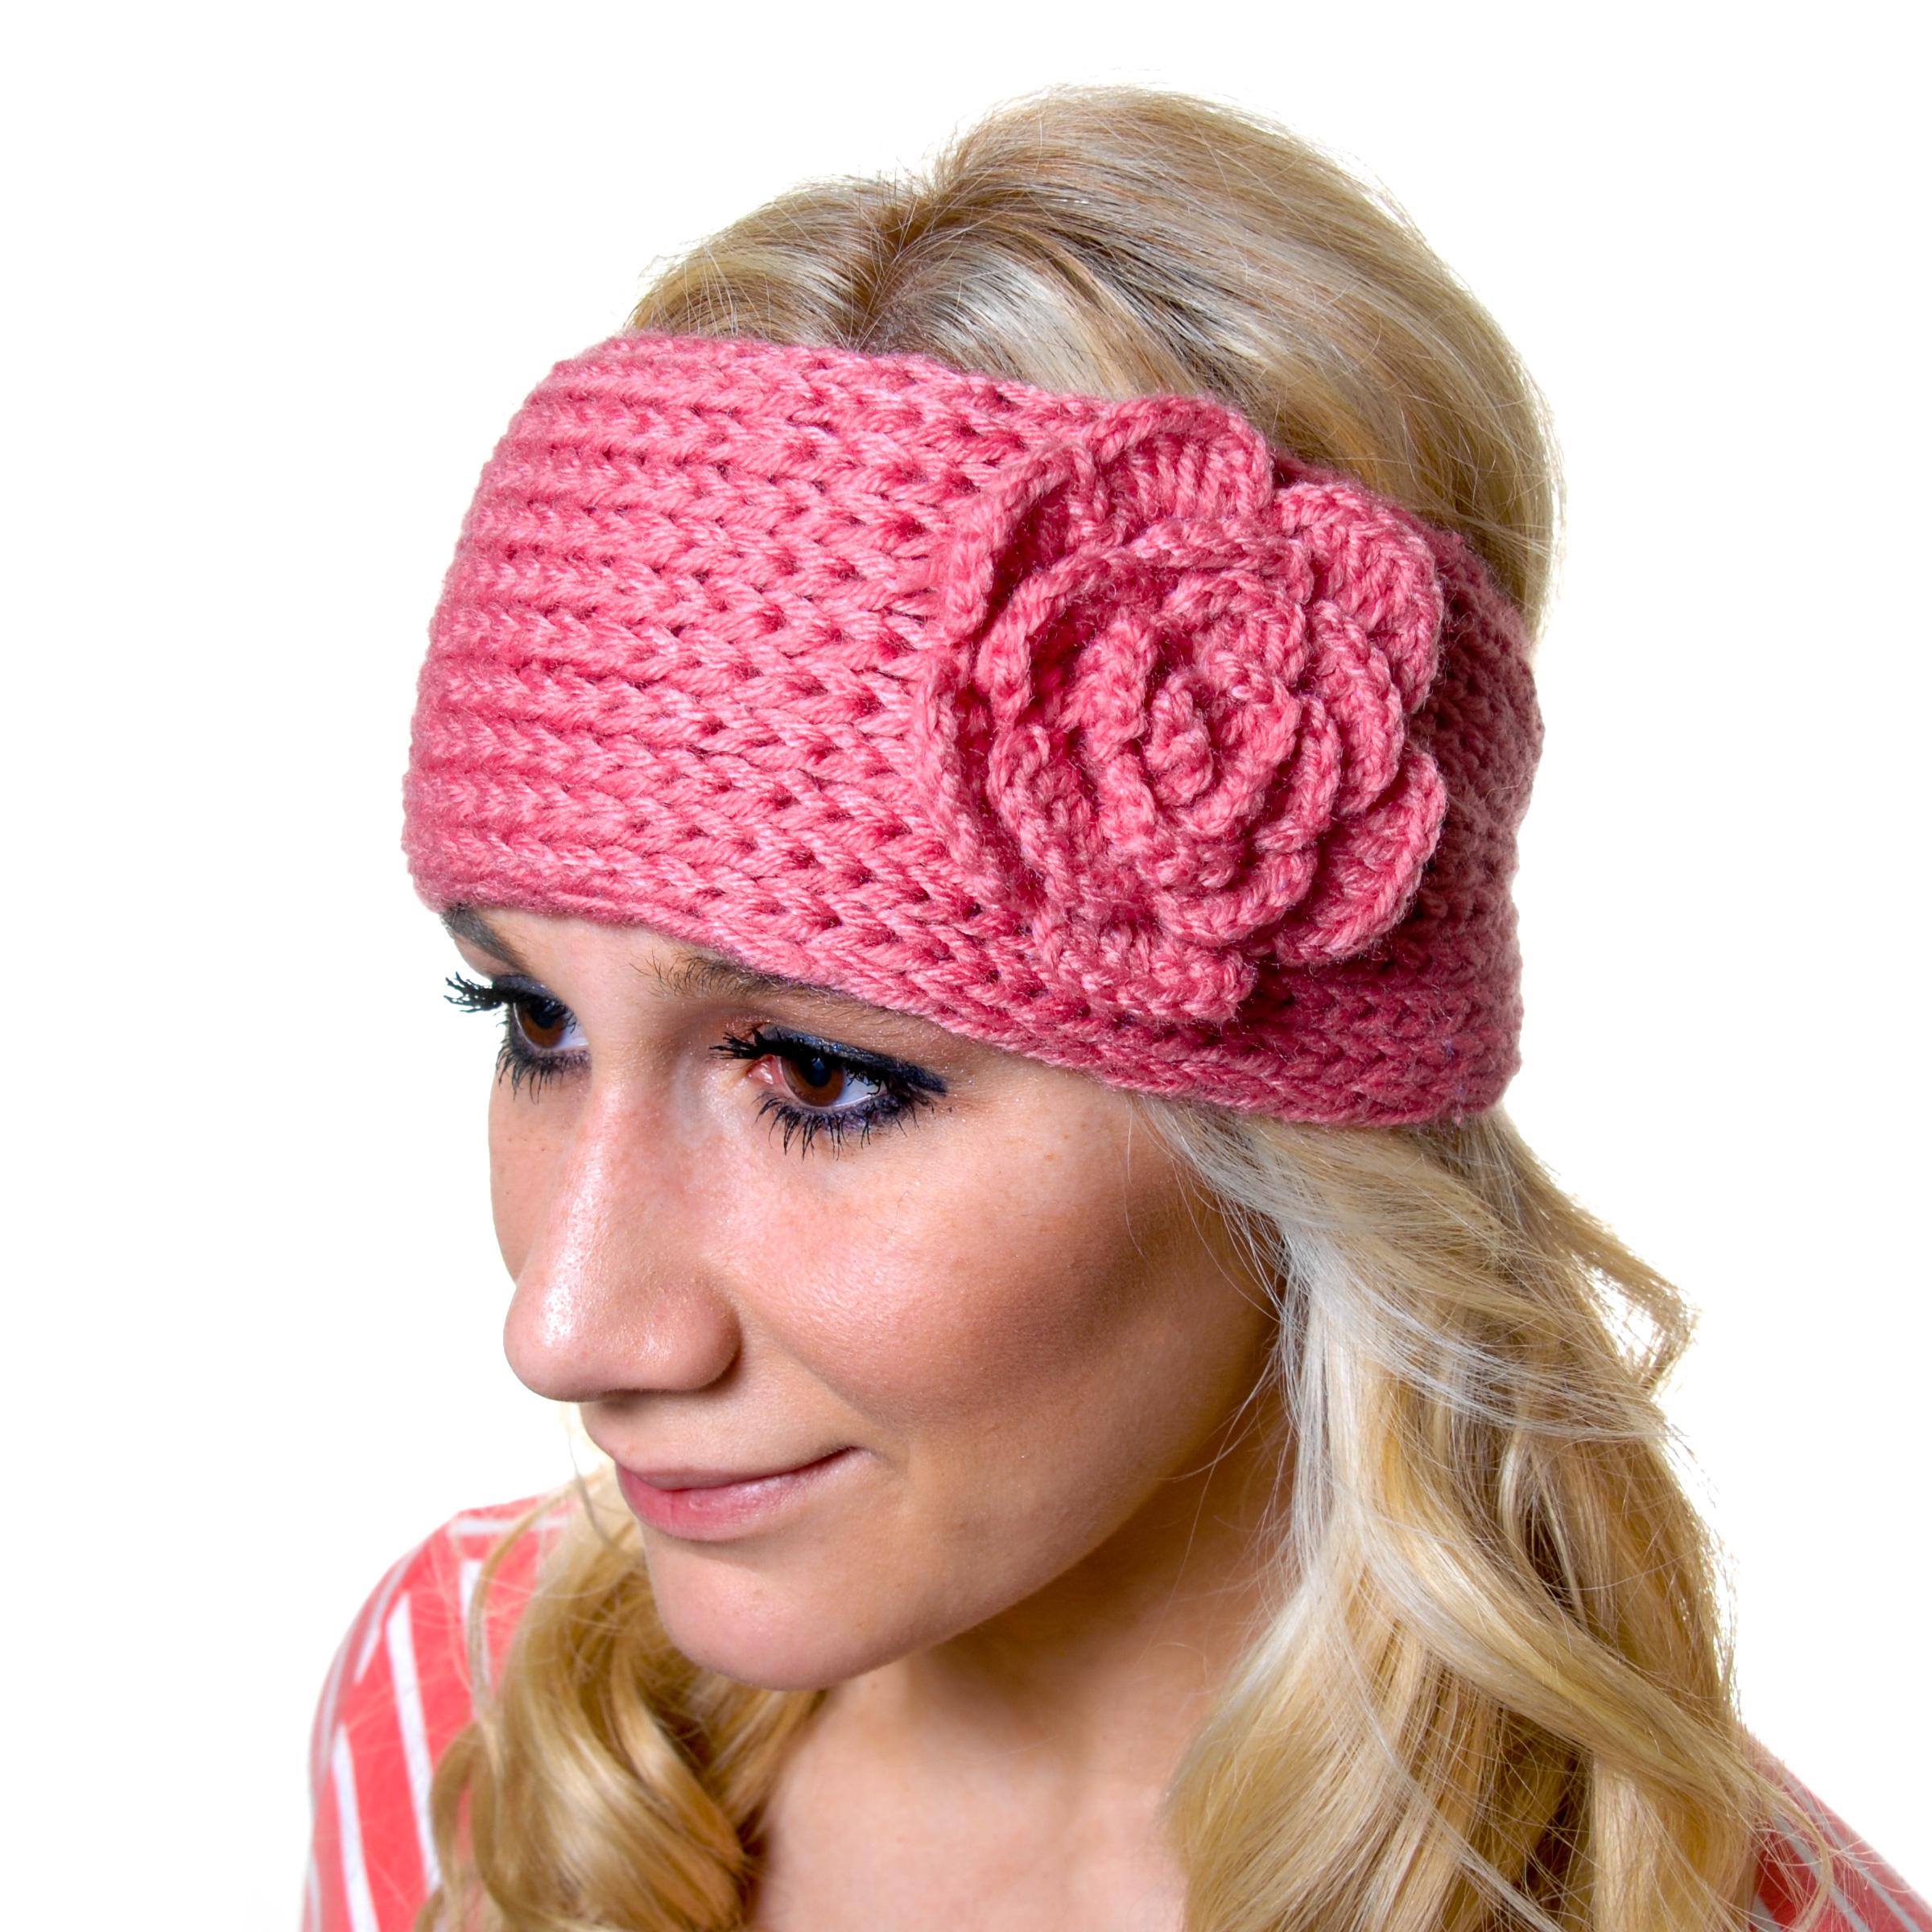 crochet_lifestyle_pnk